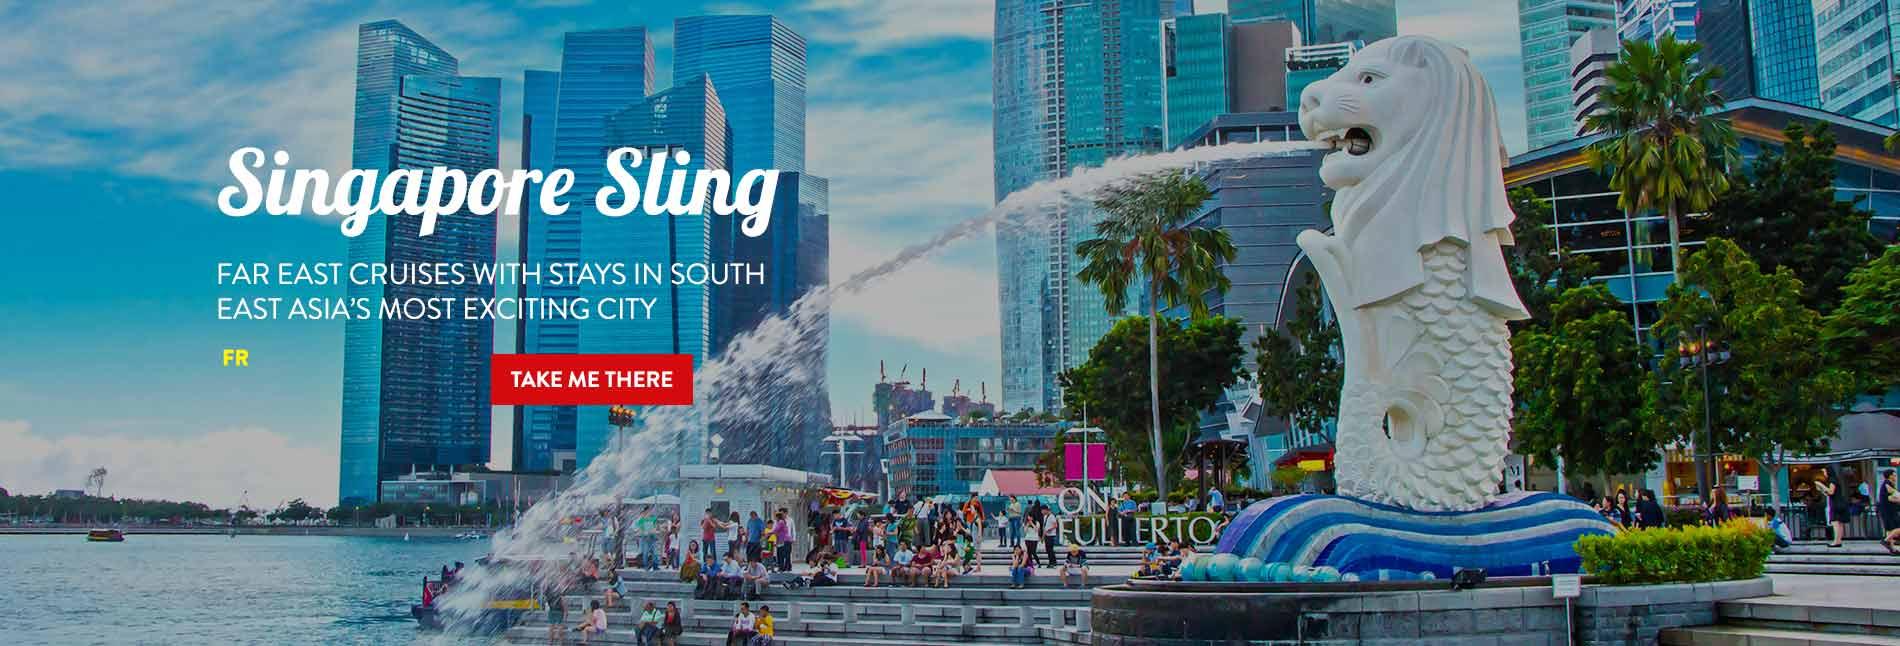 Singapore Cruise Deals